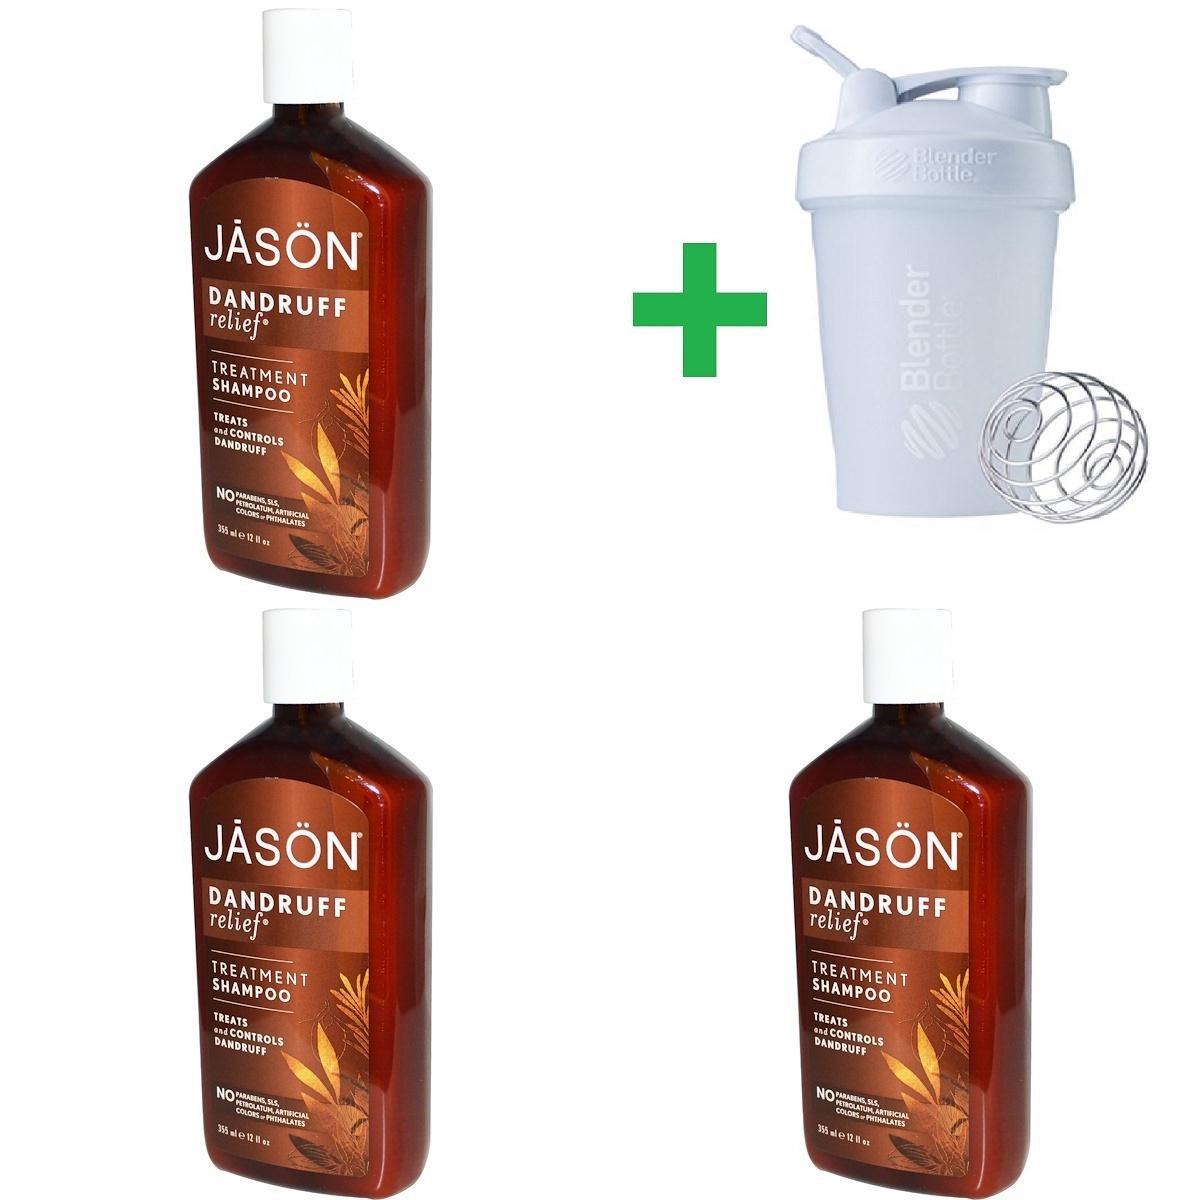 Jason Natural, Treatment Shampoo, Dandruff Relief, 12 fl oz (355 ml) (3 PCS)+ Assorted Sundesa, BlenderBottle, Classic With Loop, 20 oz